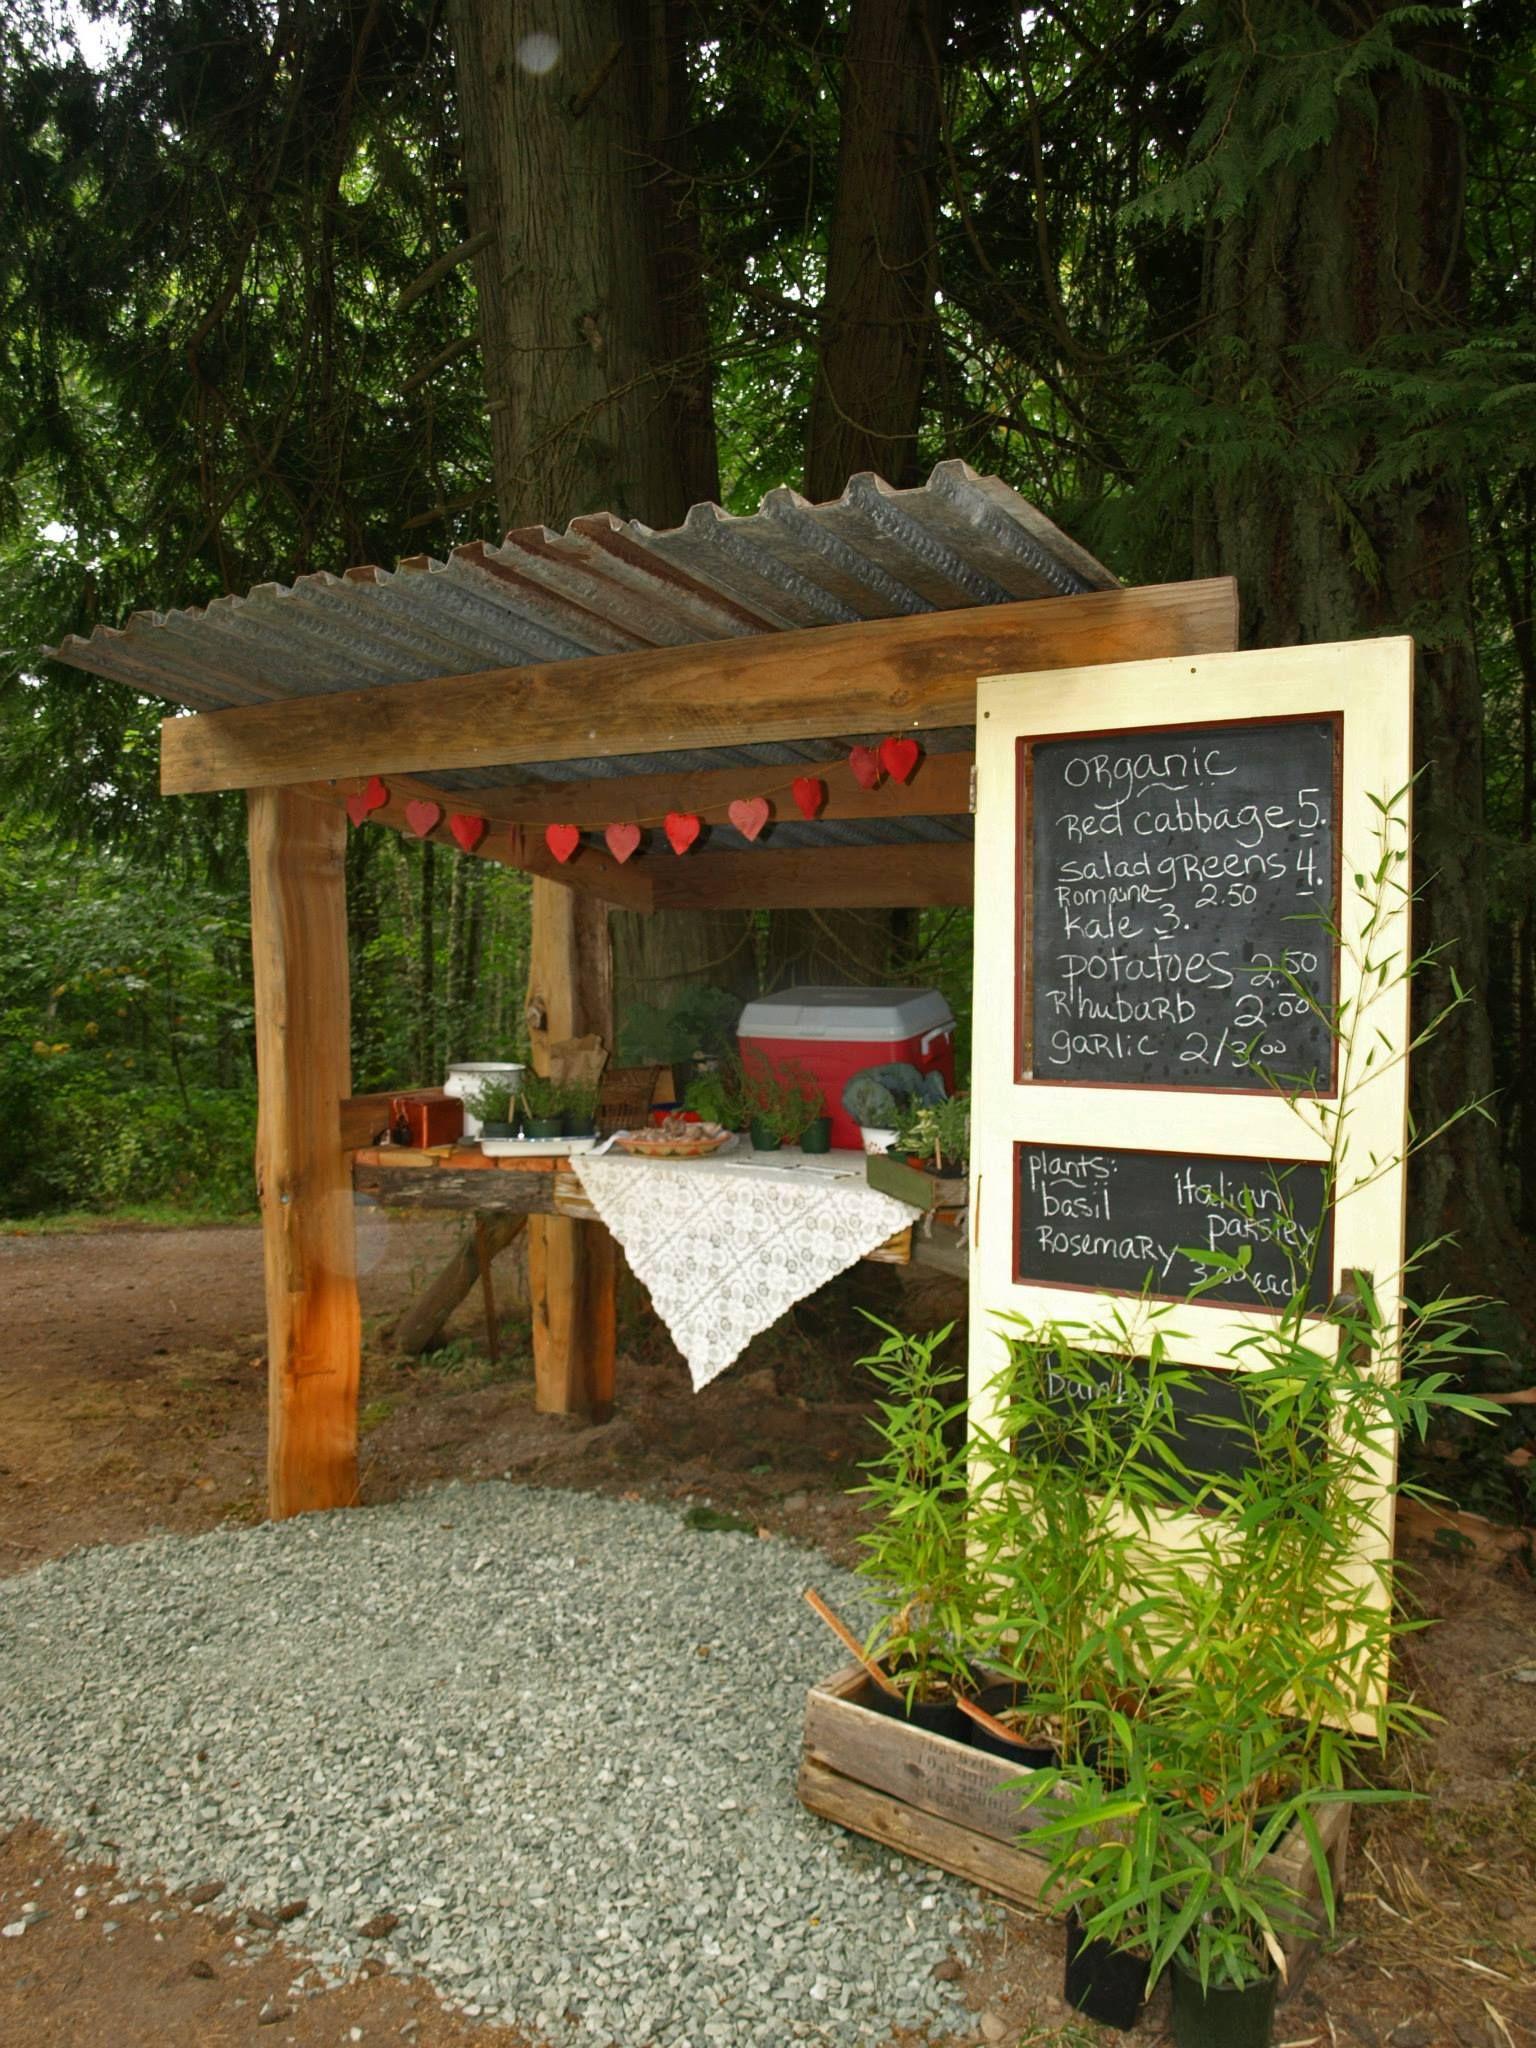 Farm Stand, Salt Spring Island, B.C. | Farmers Market | Pinterest ...